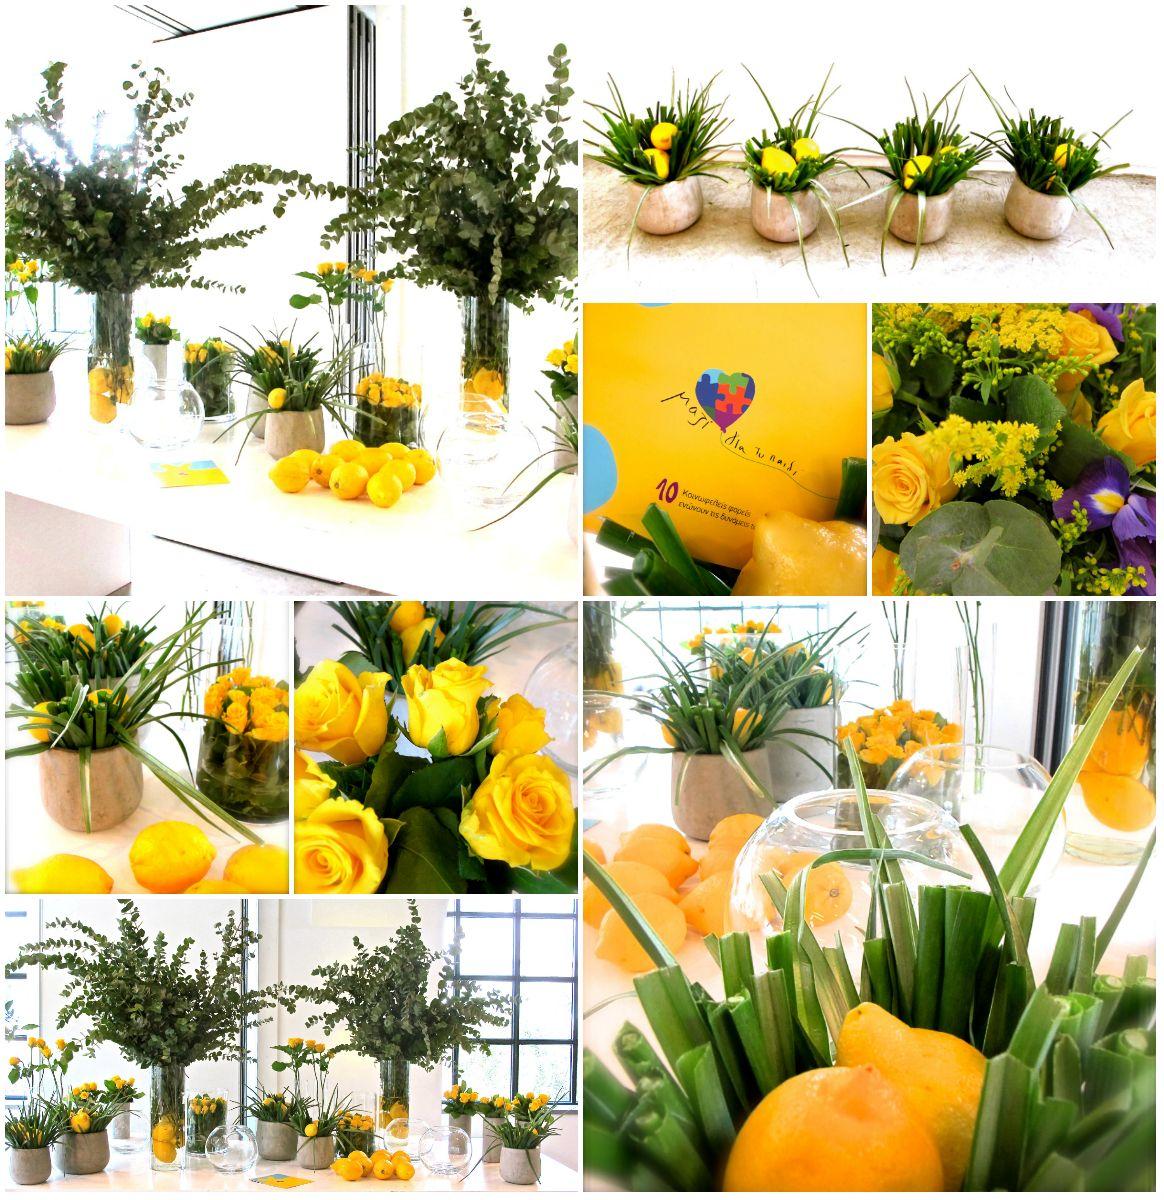 charity event-hub events-lemon tree decoration